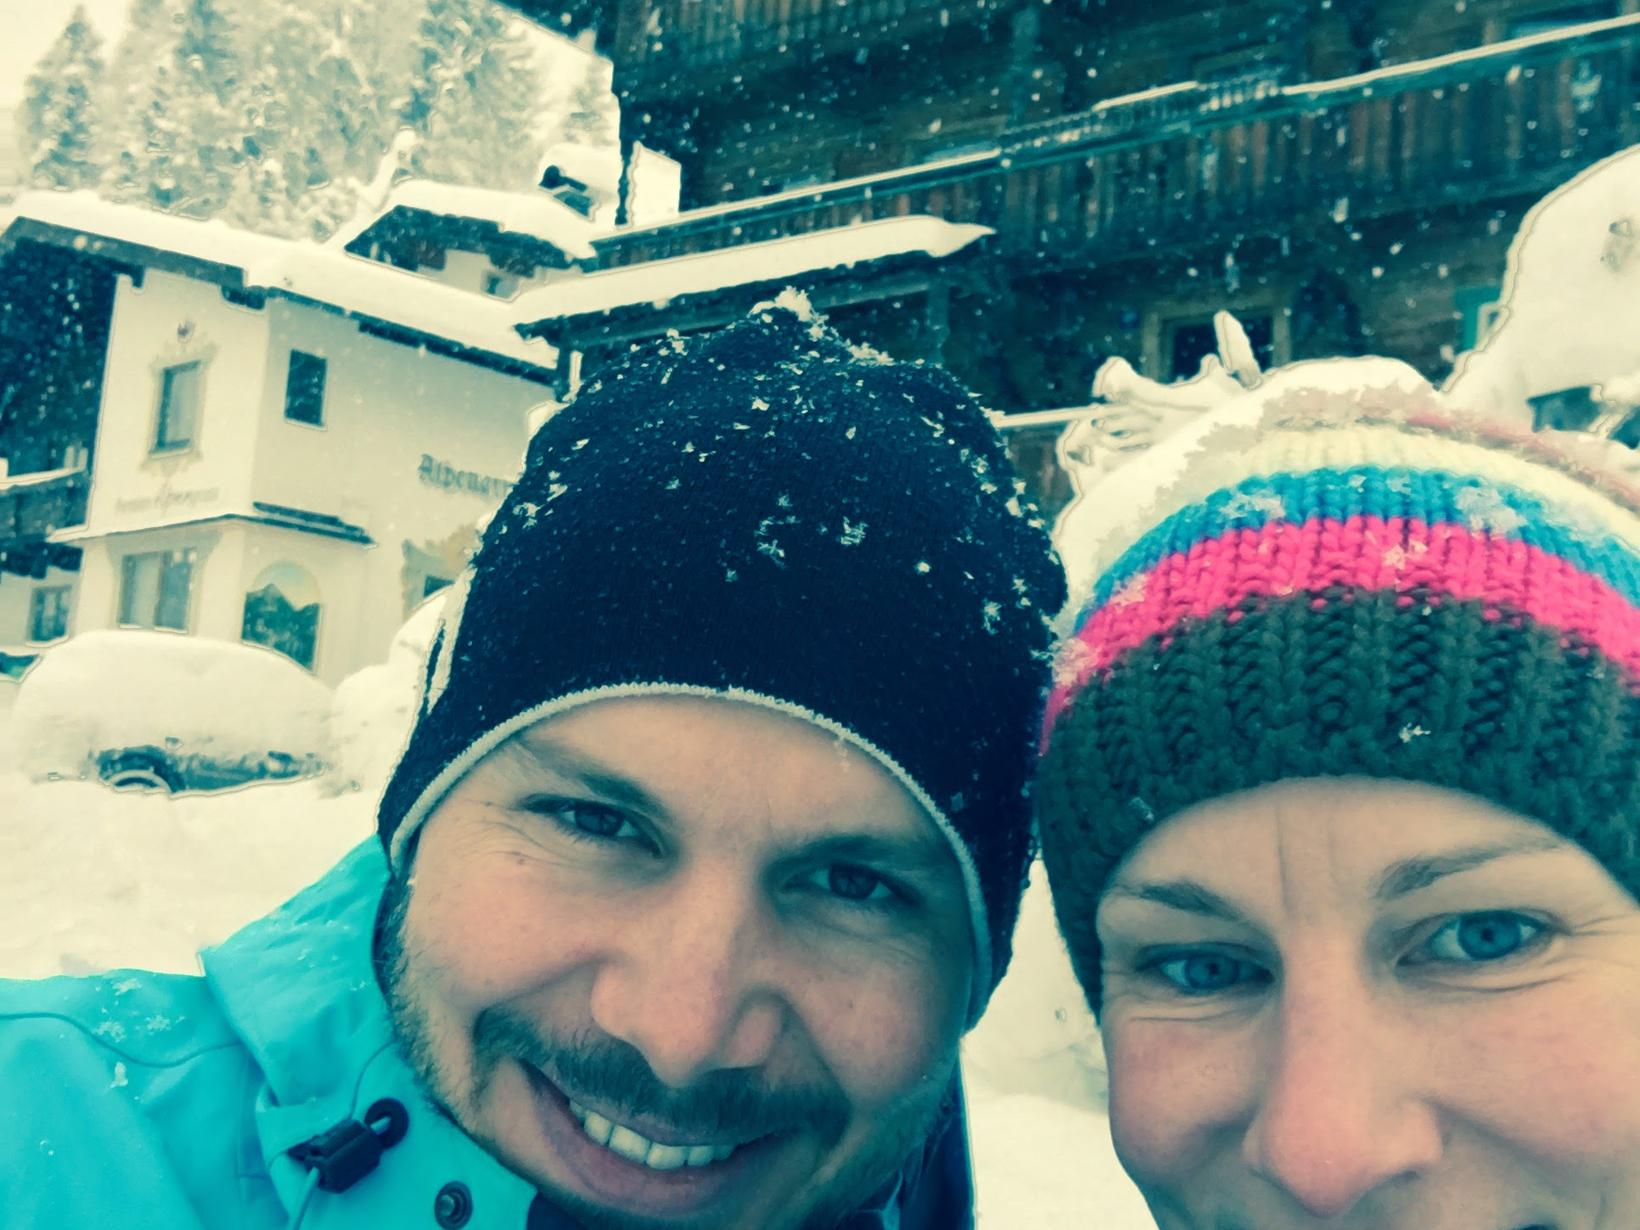 Steffi & Thomas from Nürnberg, Germany